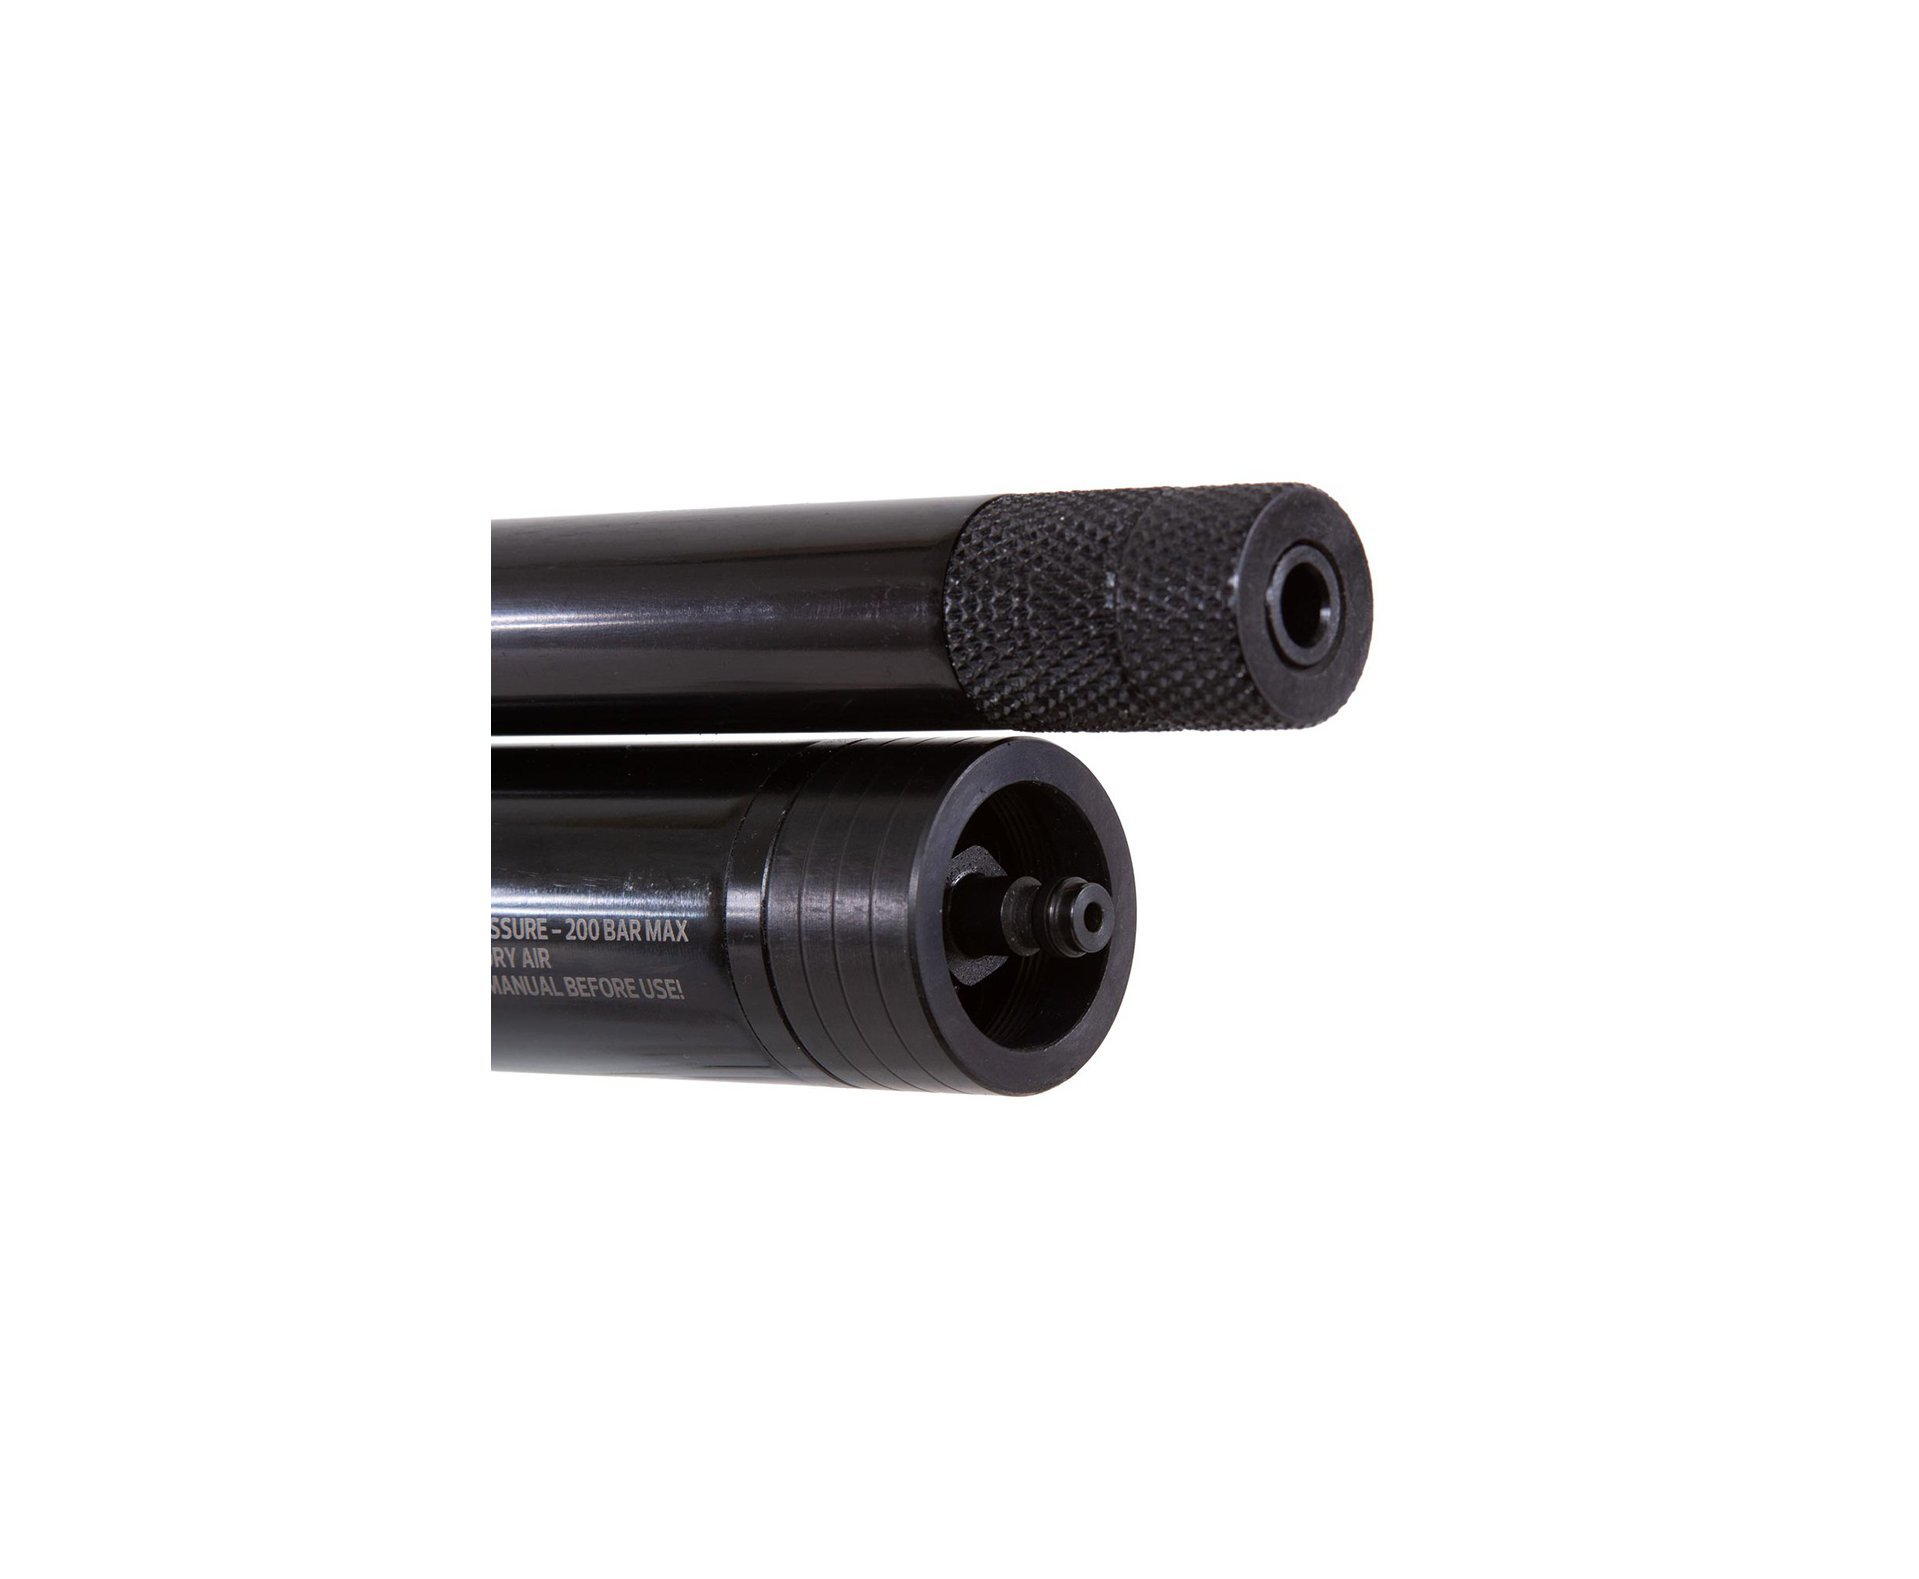 Artefato de Pressão PCP MX7 Syntethic Regulated 5.5mm Aselkon